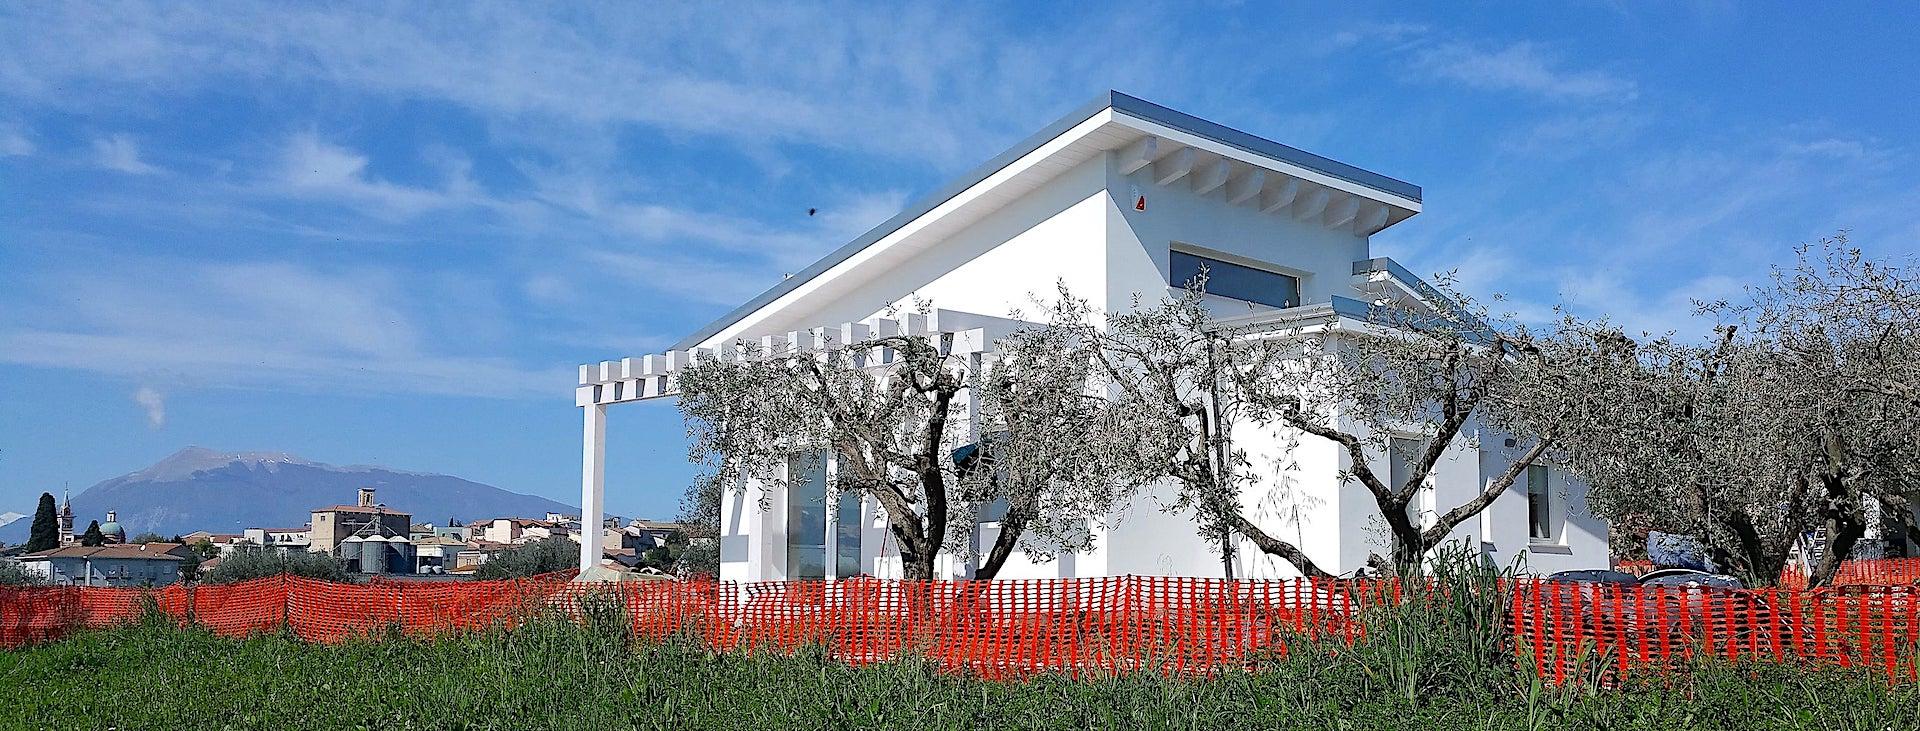 Villa Prefabbricata